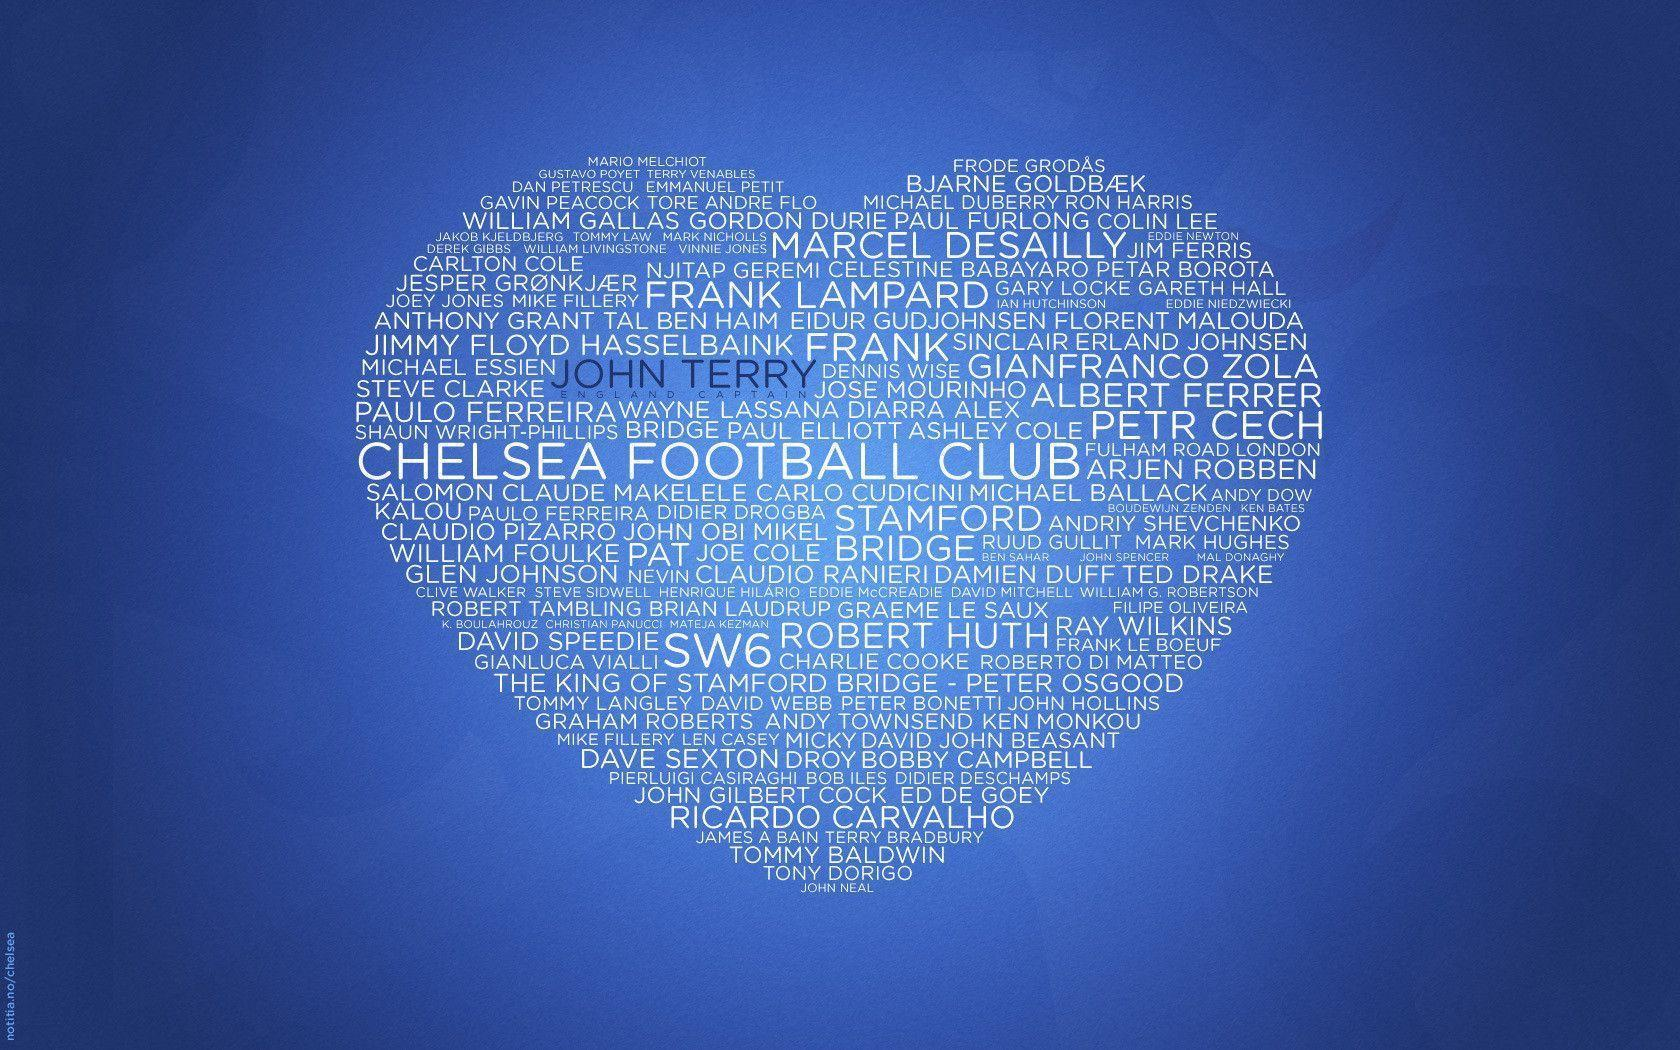 Chelsea Football Club Logo Wallpaper Download #8644 Wallpaper ...